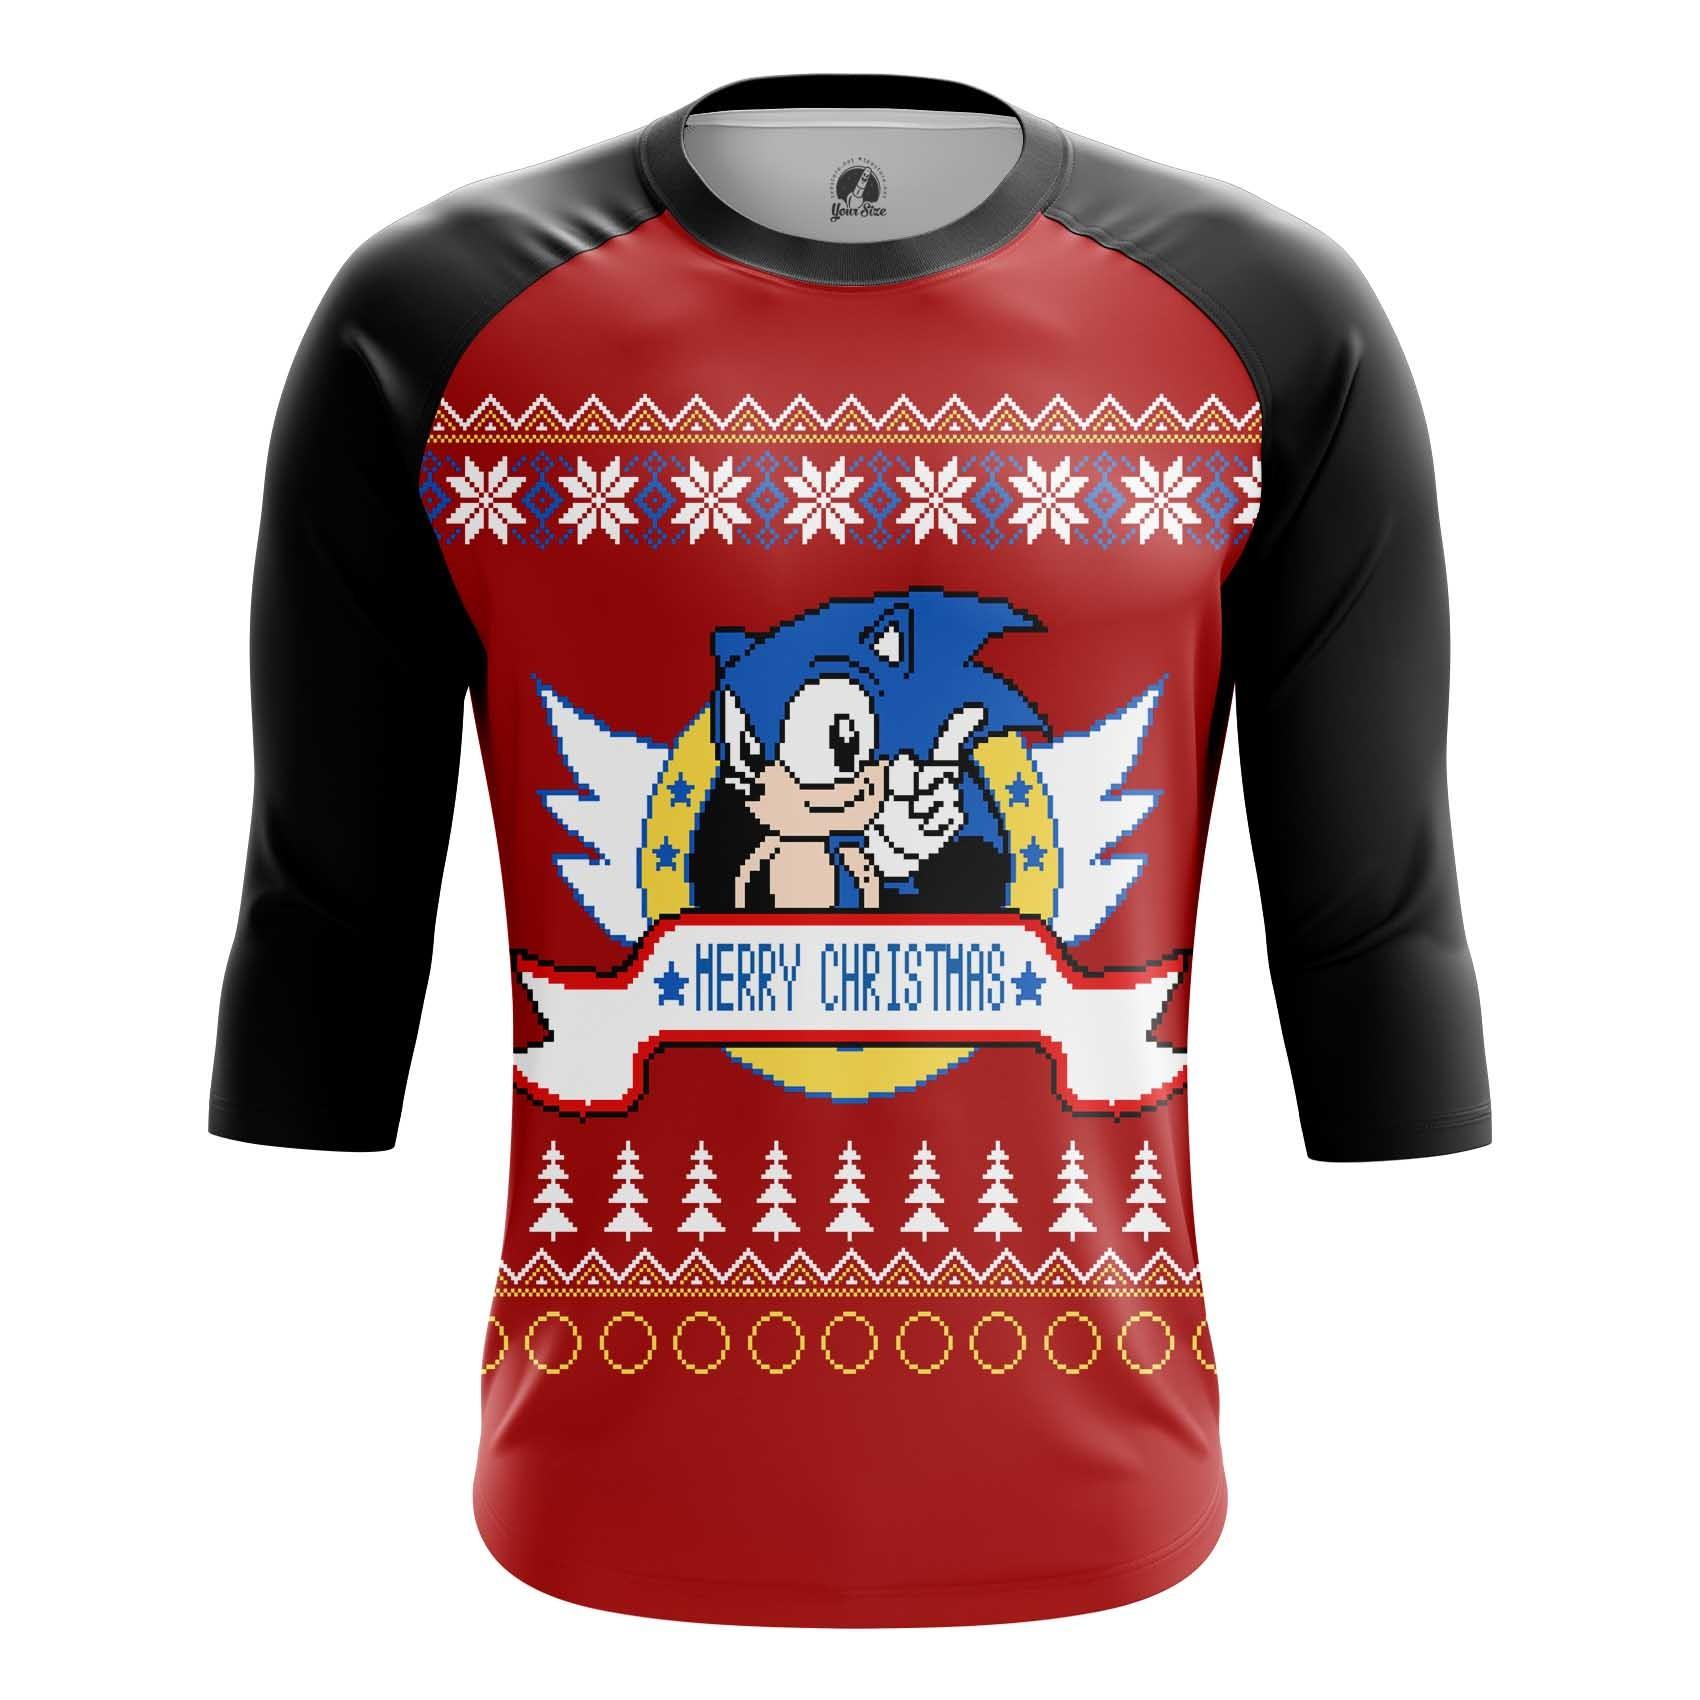 Merchandise Men'S T-Shirt Sonic Sonic Hedgehog X-Mas Christmas Special